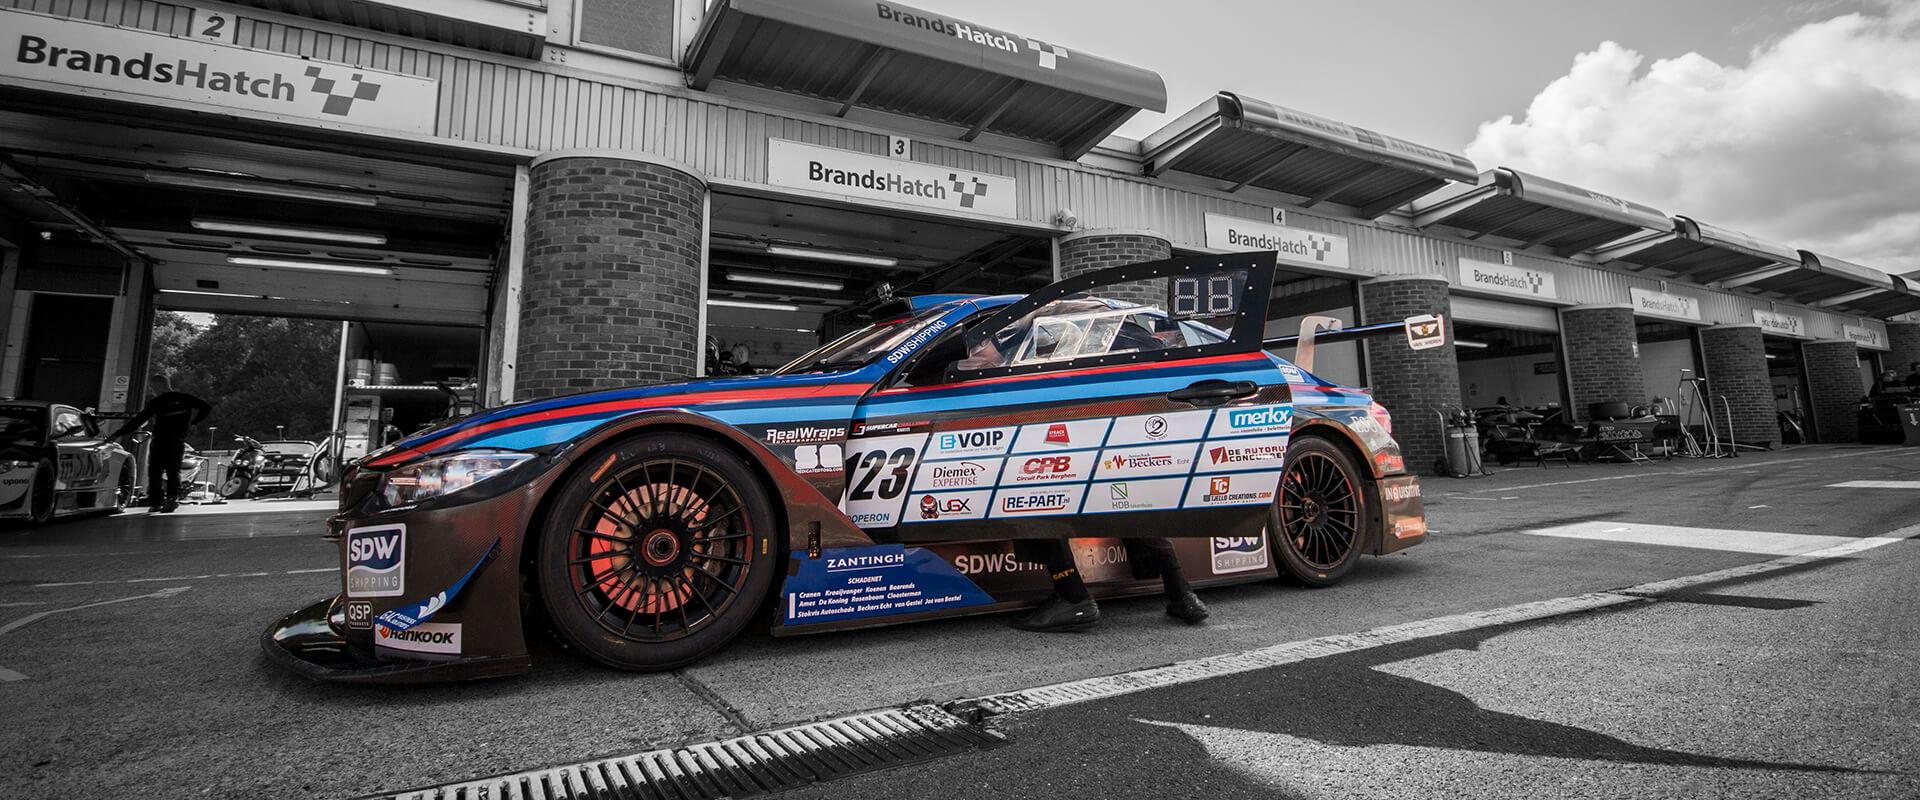 M4 pit Brands Hatch